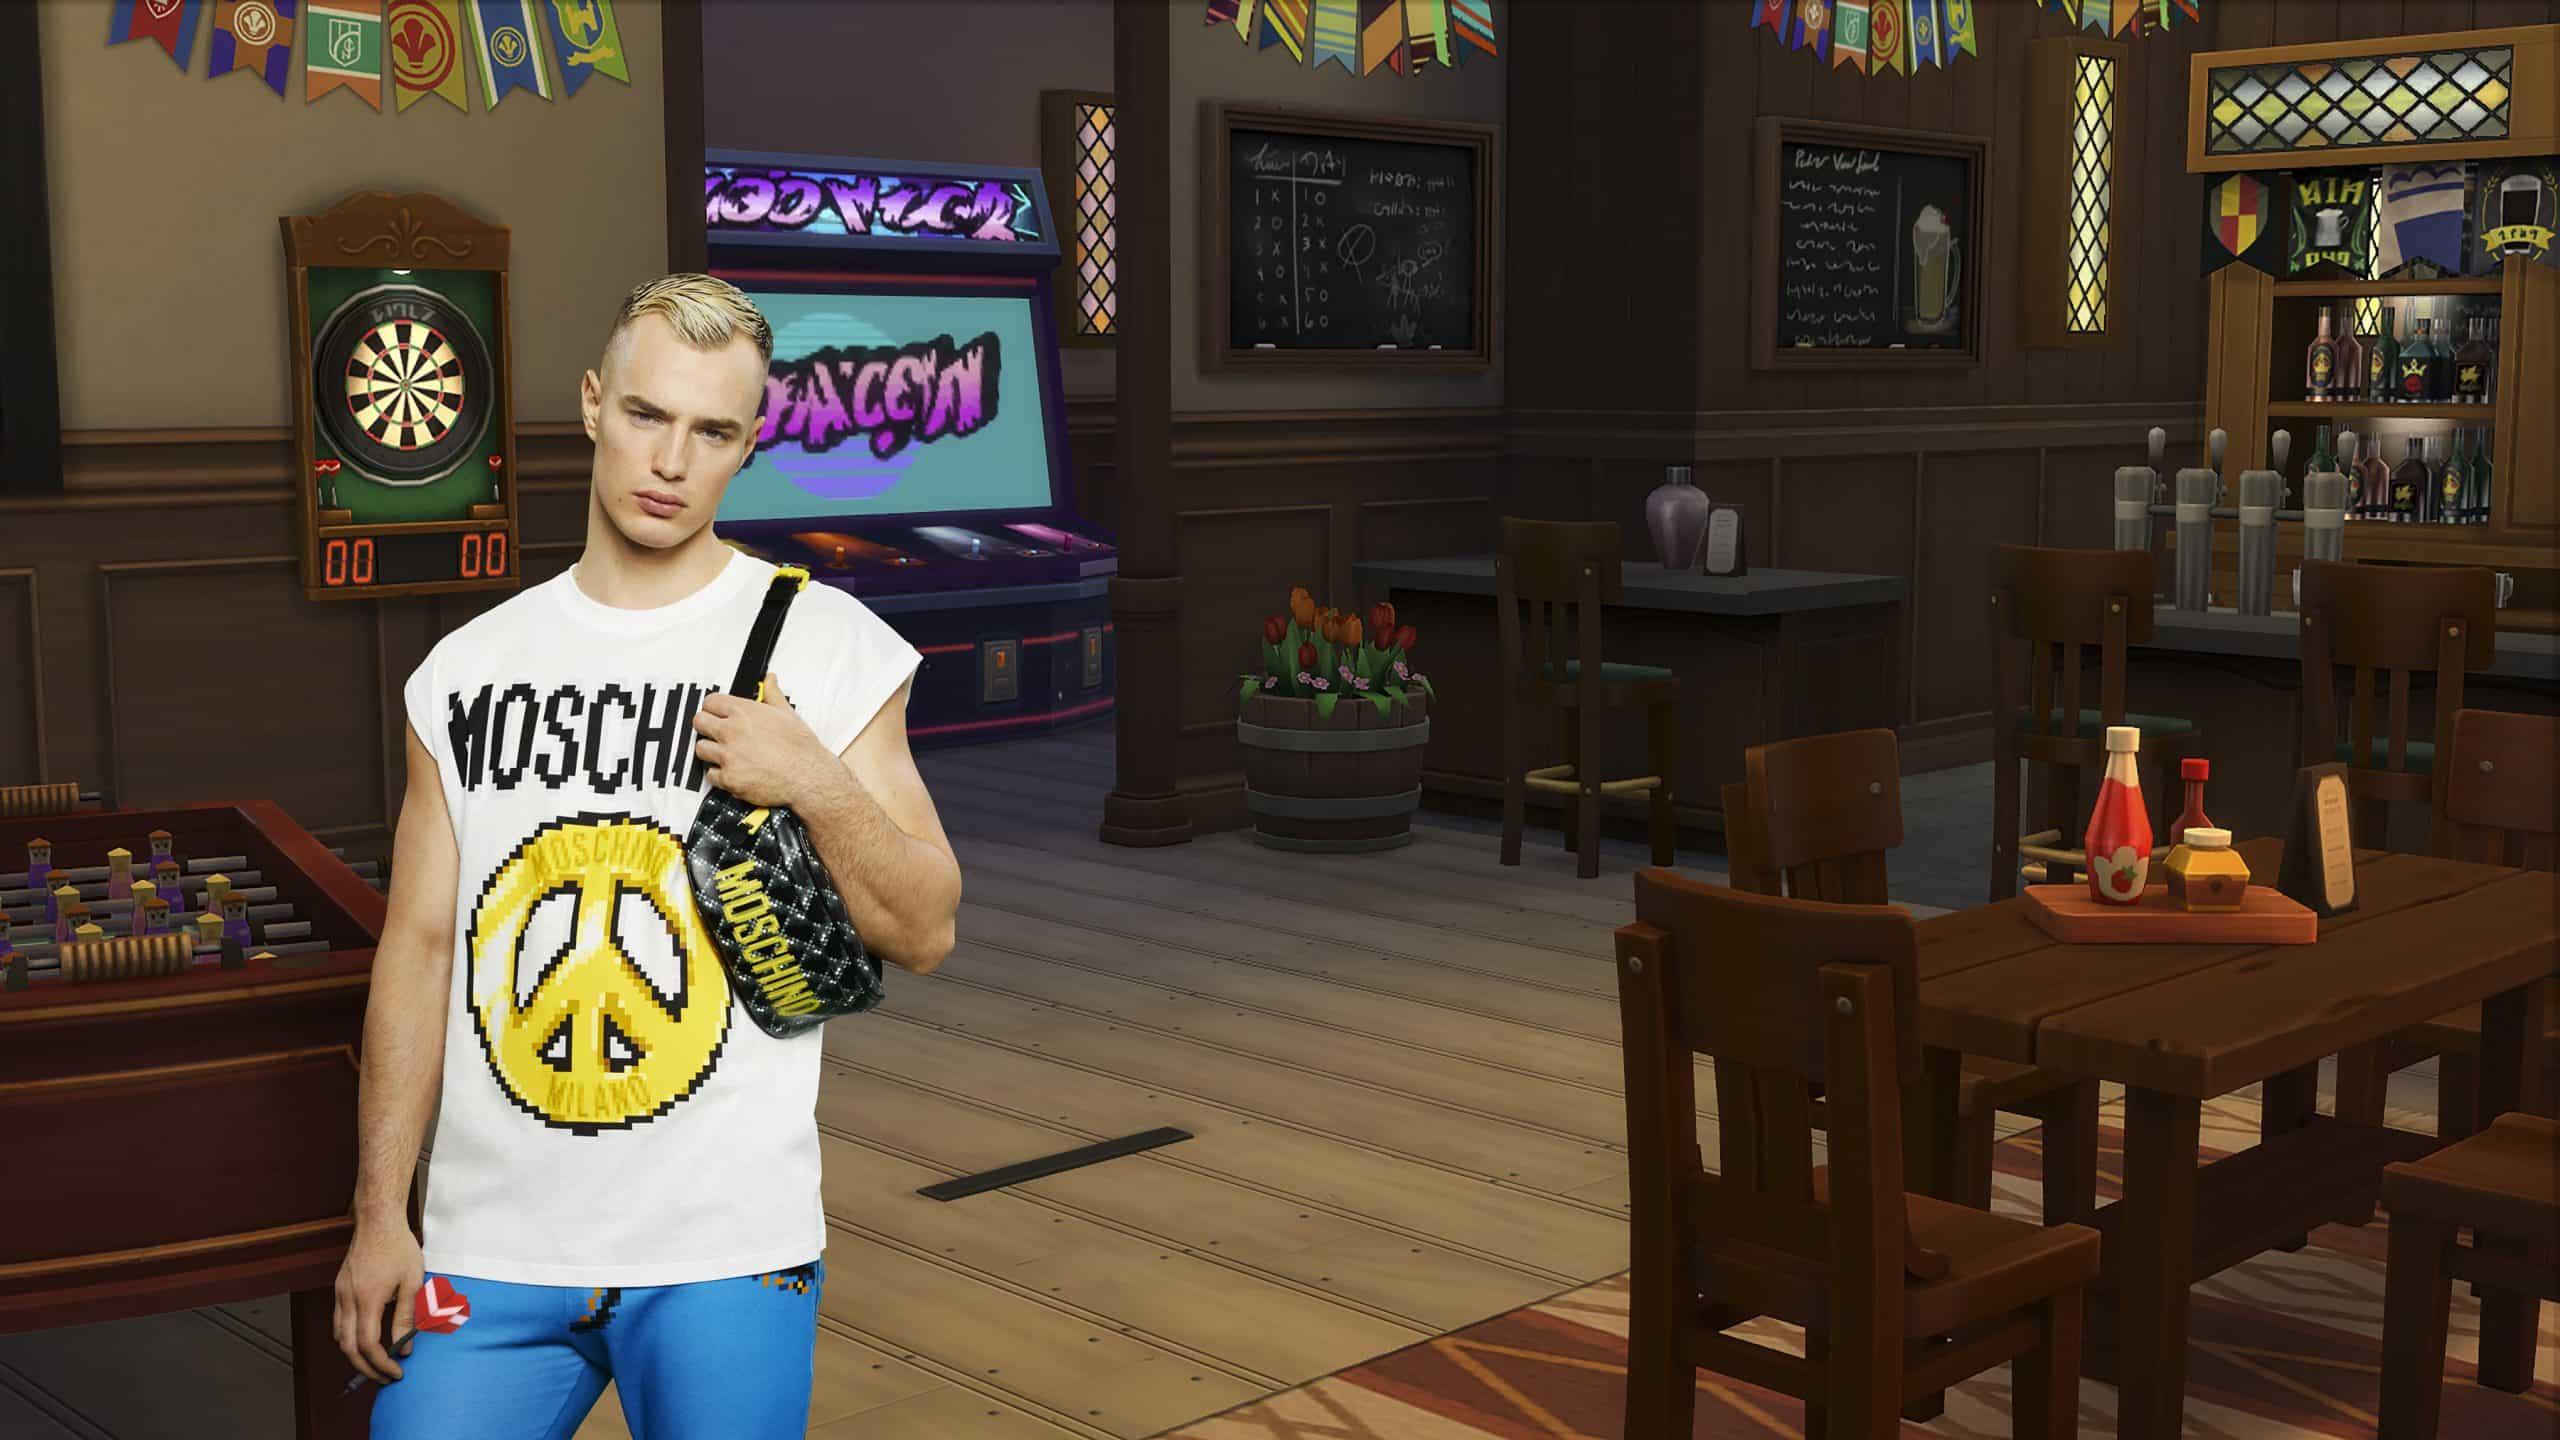 The Sims X Moschino: Promo Shots